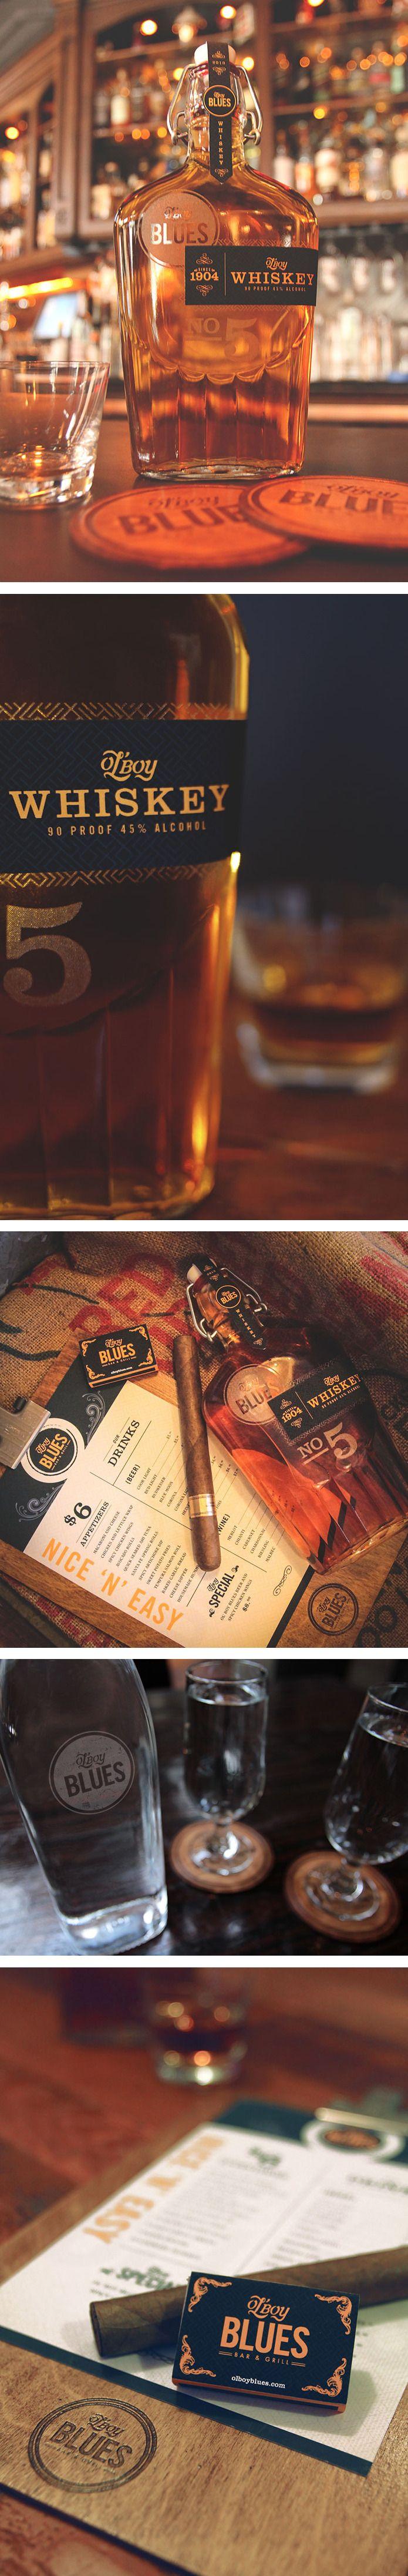 Ol' Boy Blues Whiskey bottle and branding